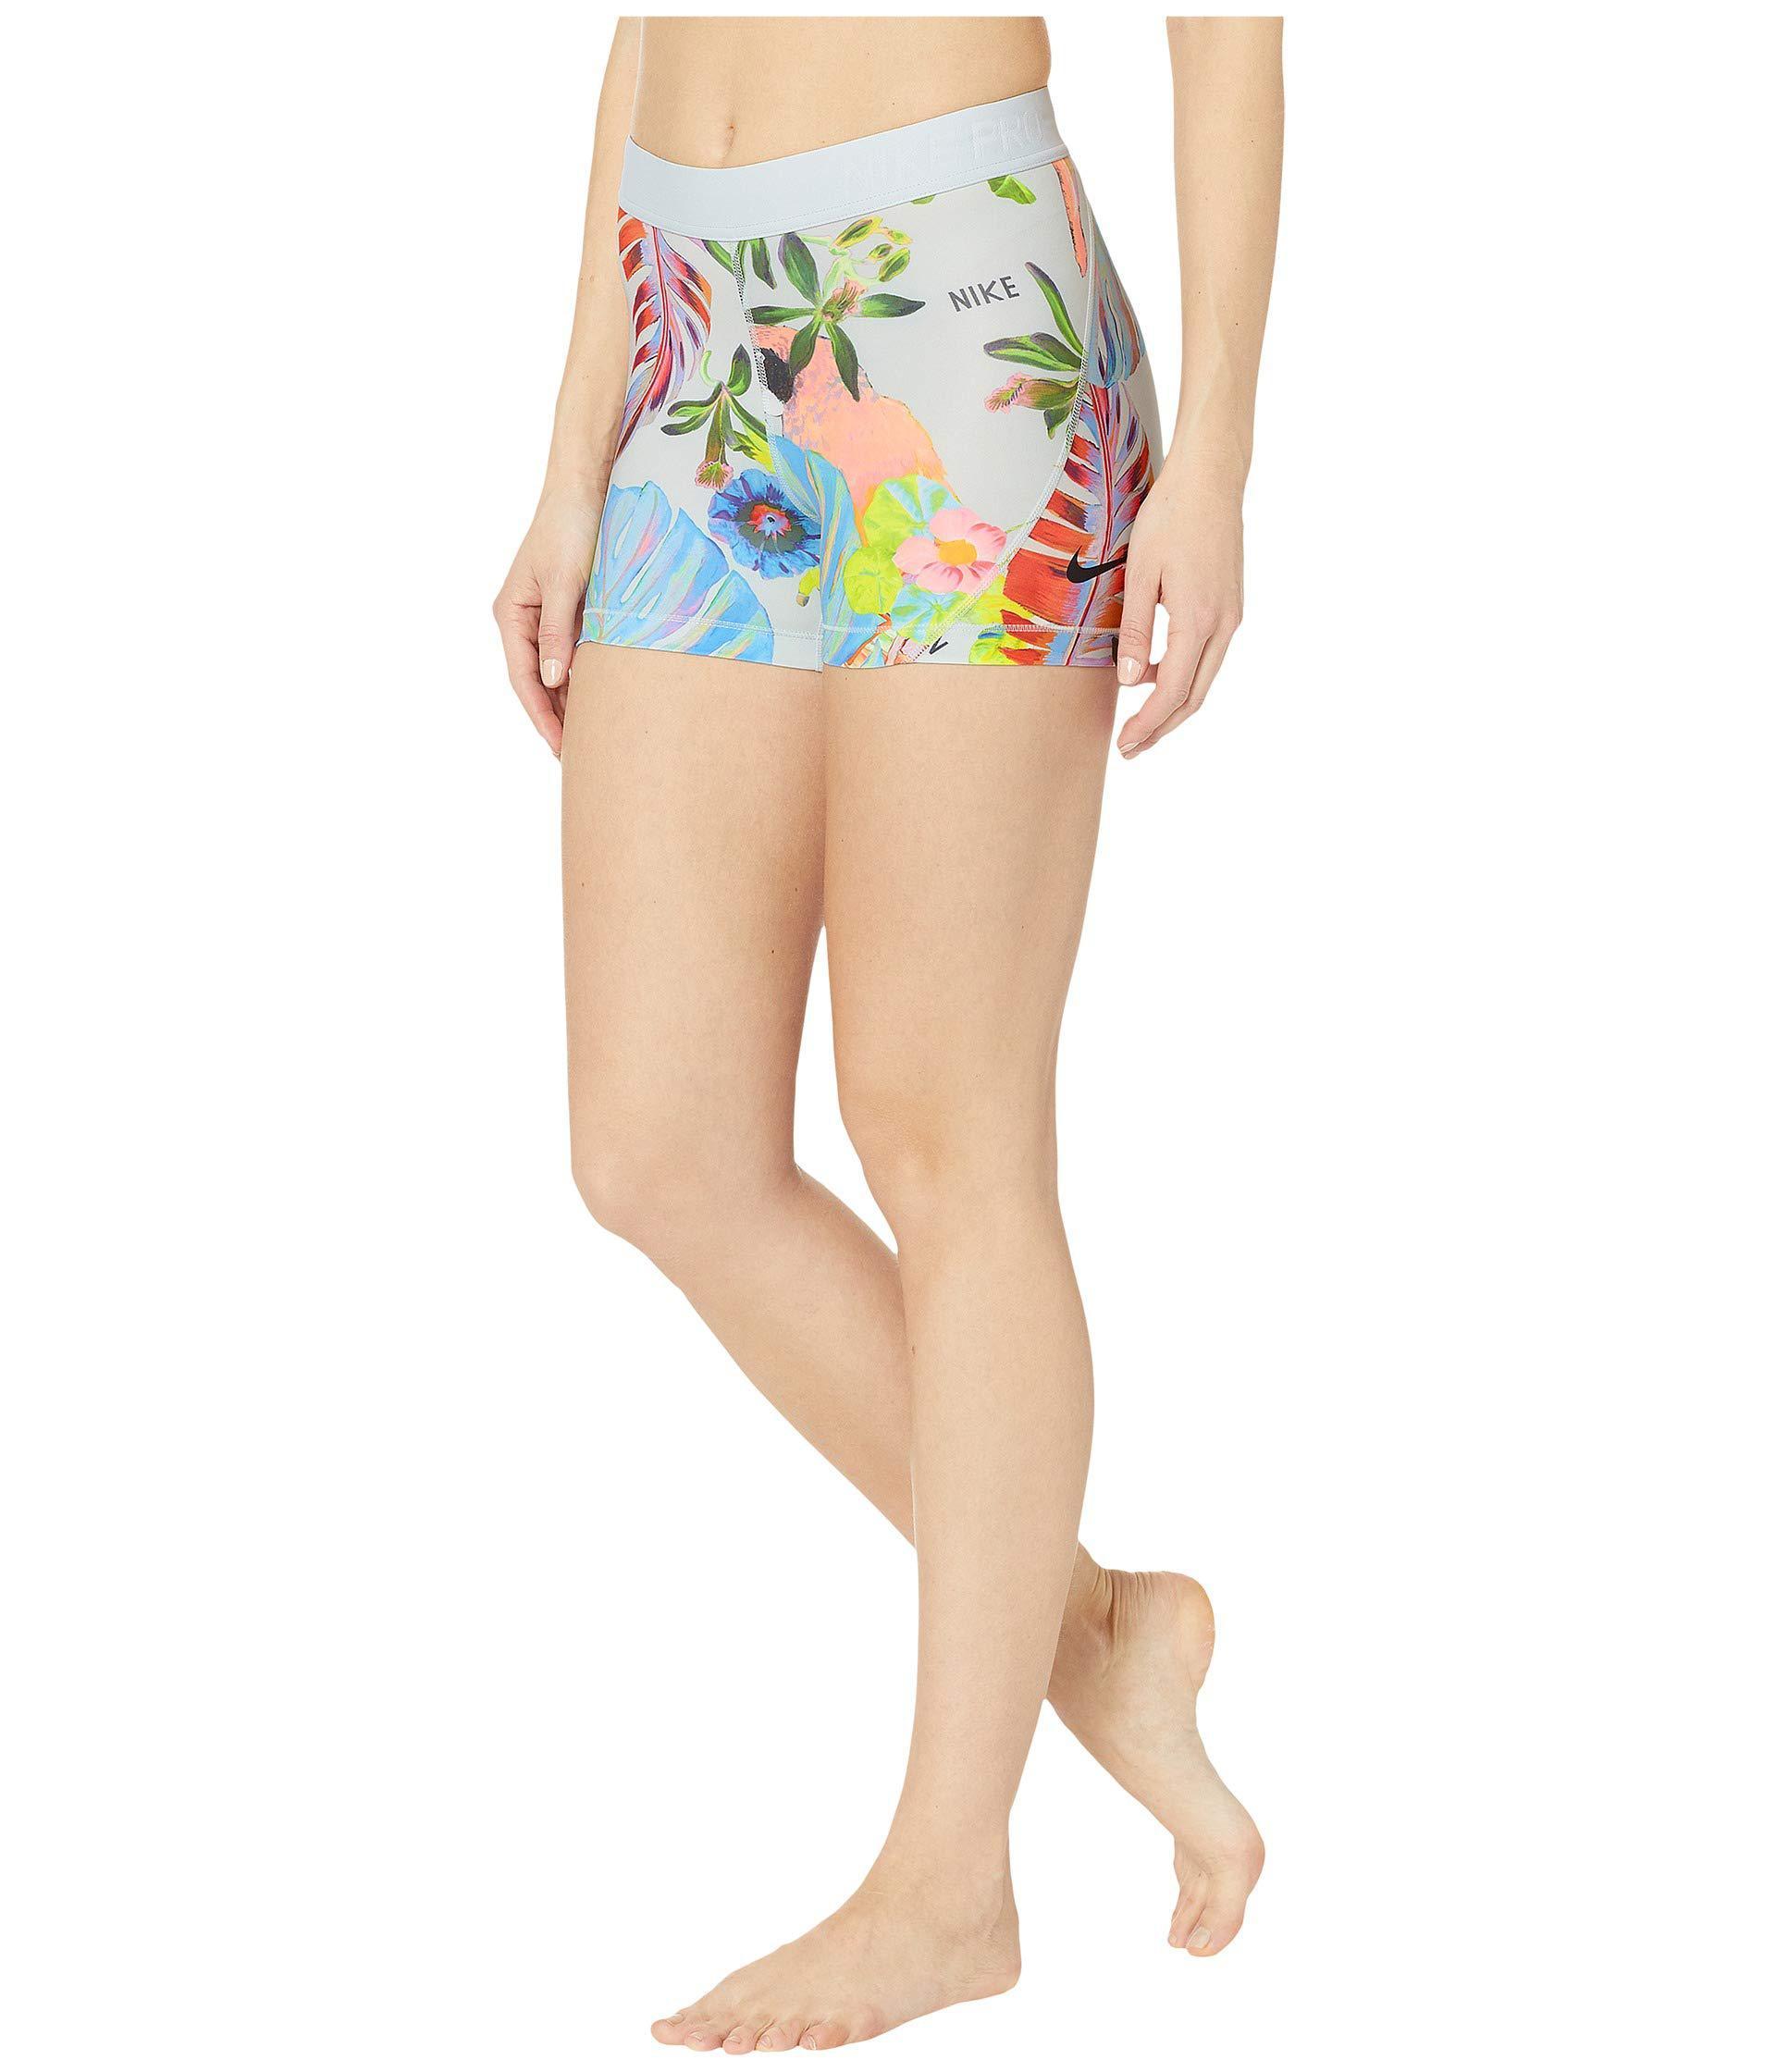 Pro 3 Hyper Femme Shorts Pure Platinumblack Womens Shorts